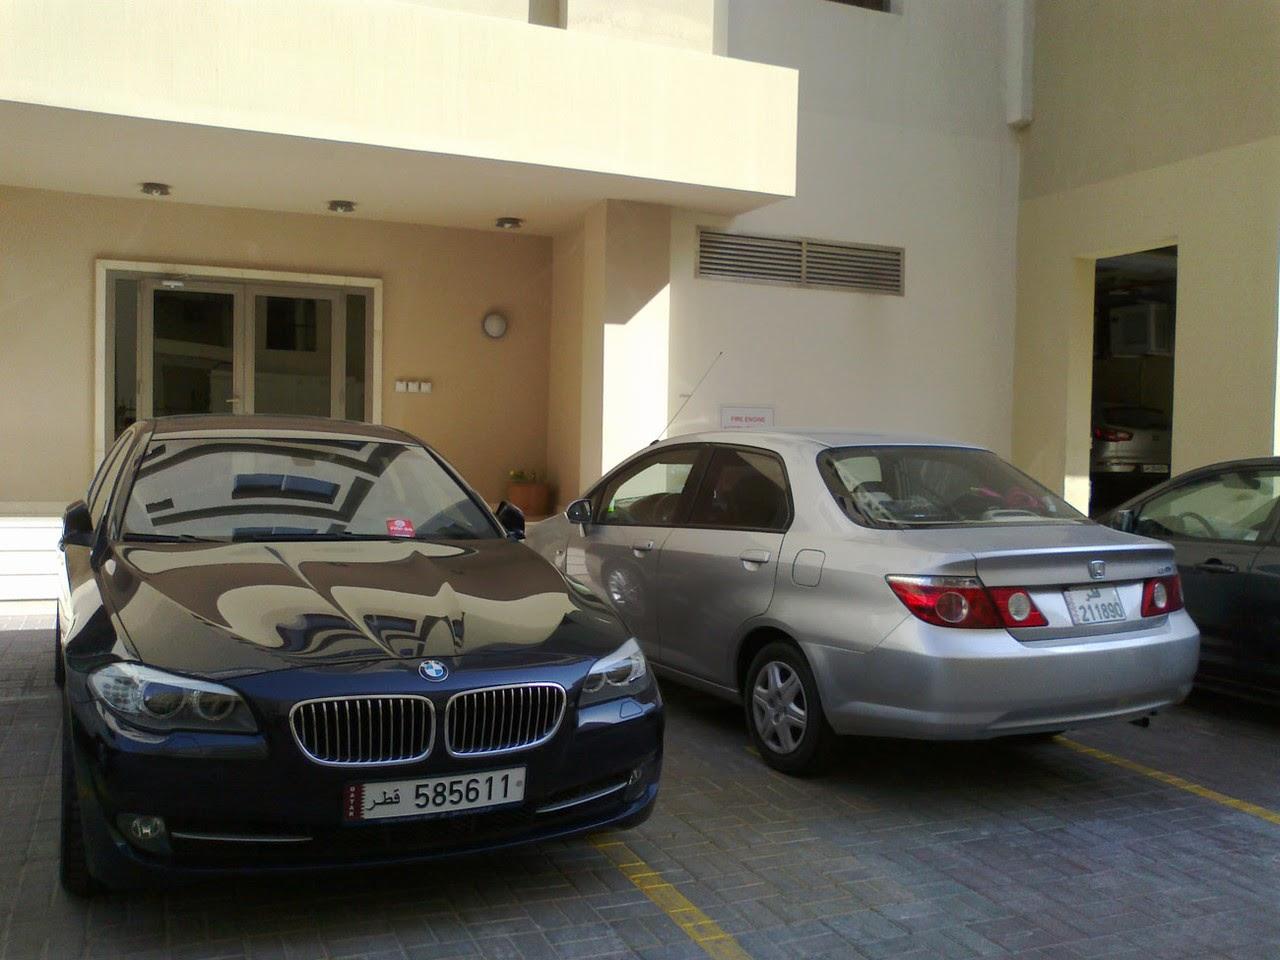 http://asalasah.blogspot.com/2014/01/bedanya-parkir-mobil-rumahan-di-qatar-ama-di-indonesia.html